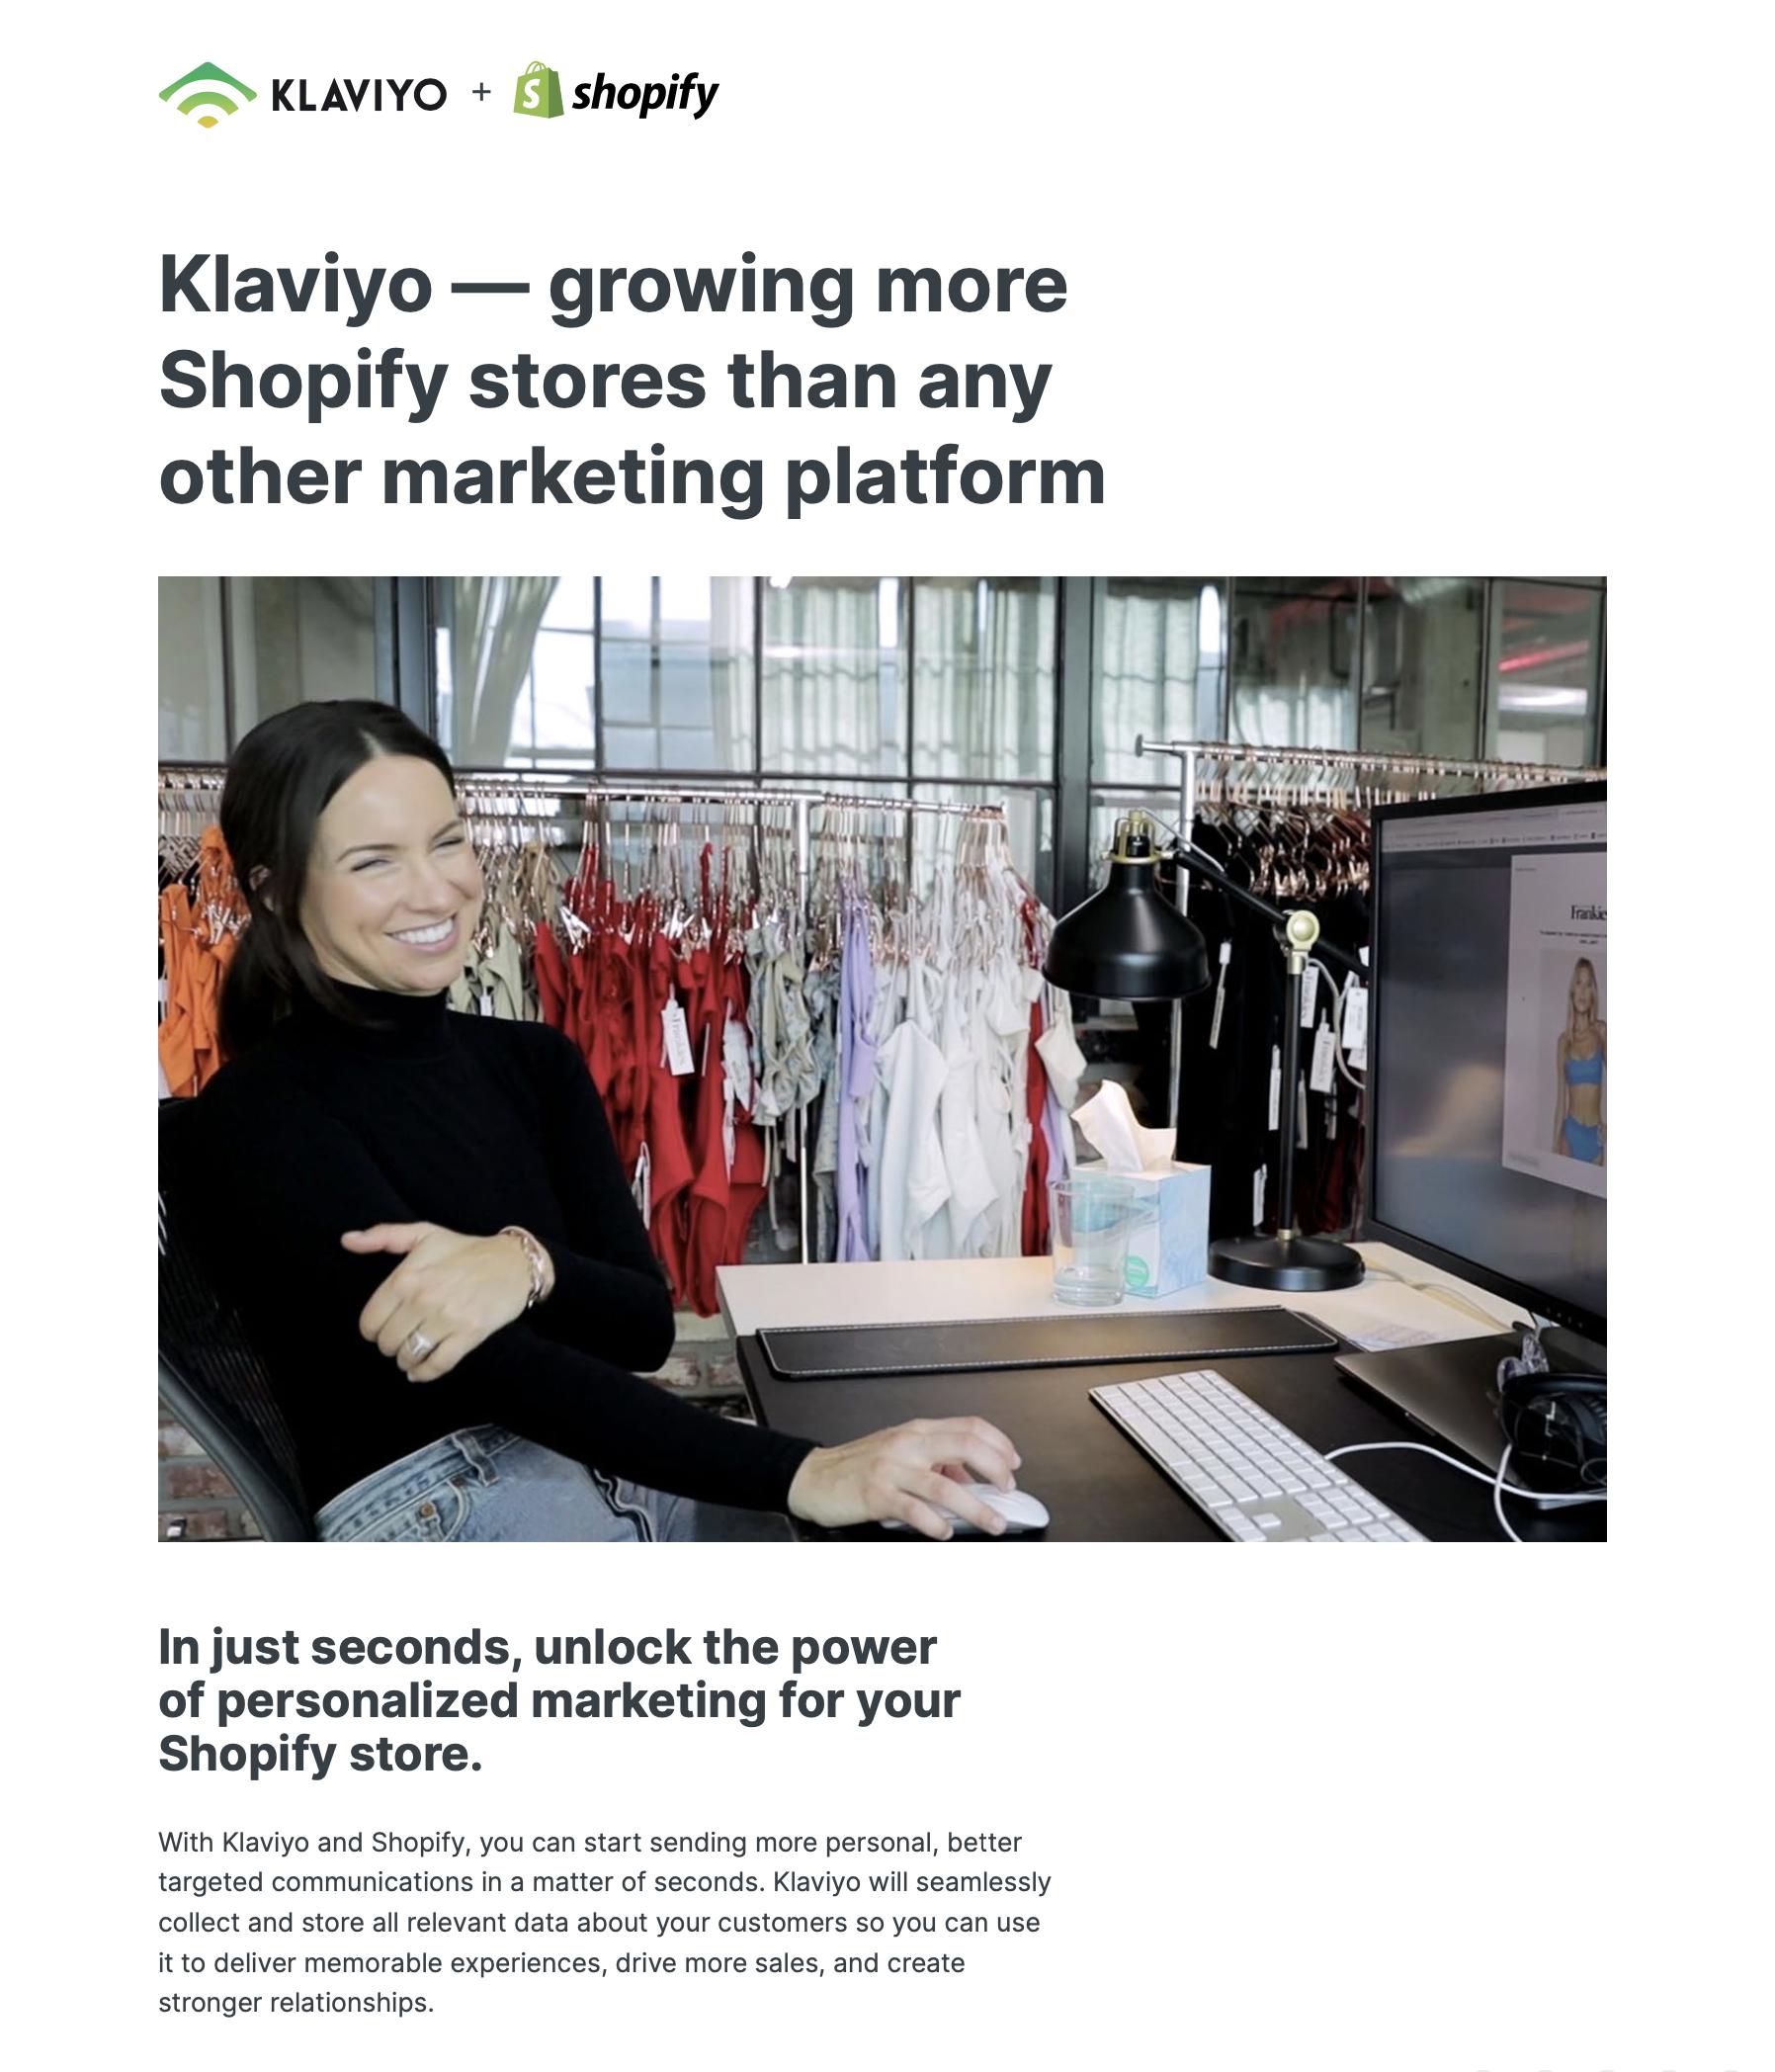 klaviyo with shopify global